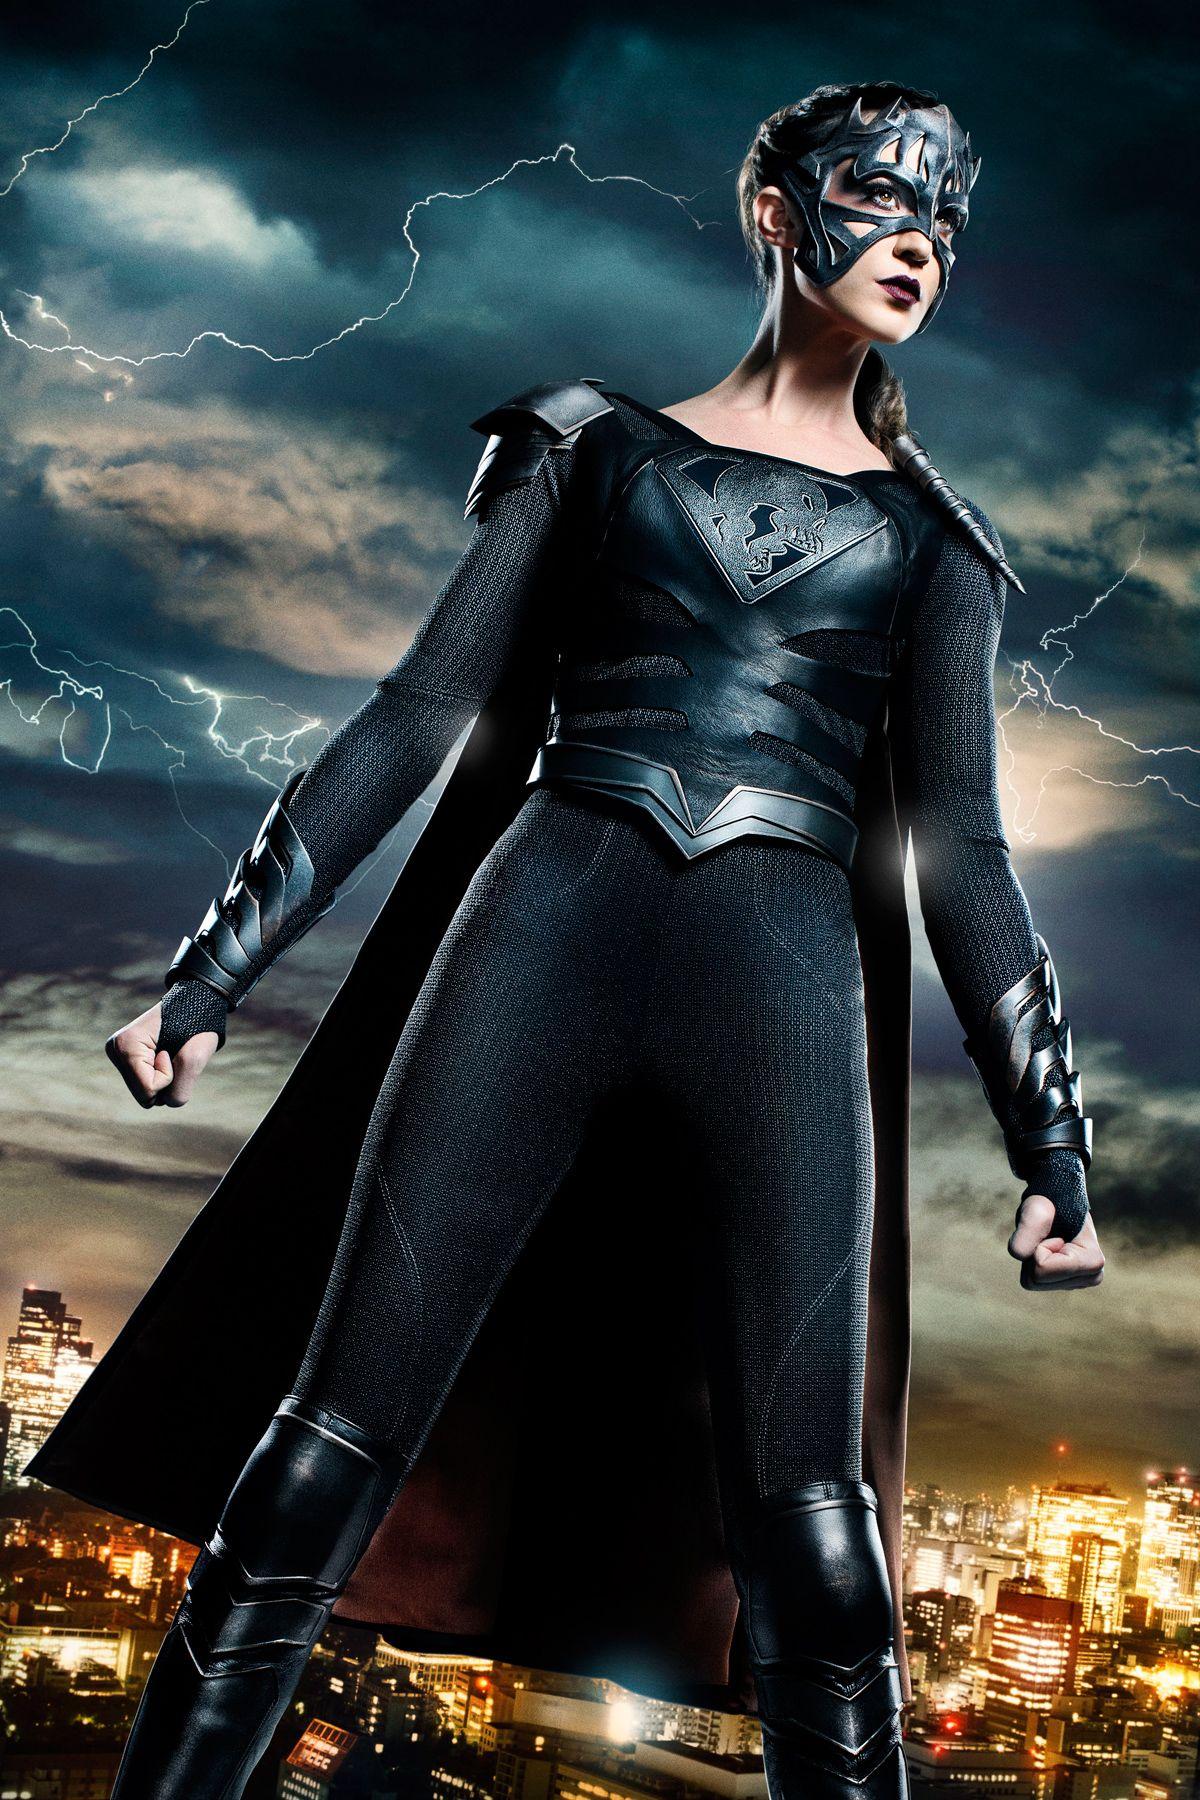 Supergirl Season 3 Villain Reign Costume Revealed | Collider